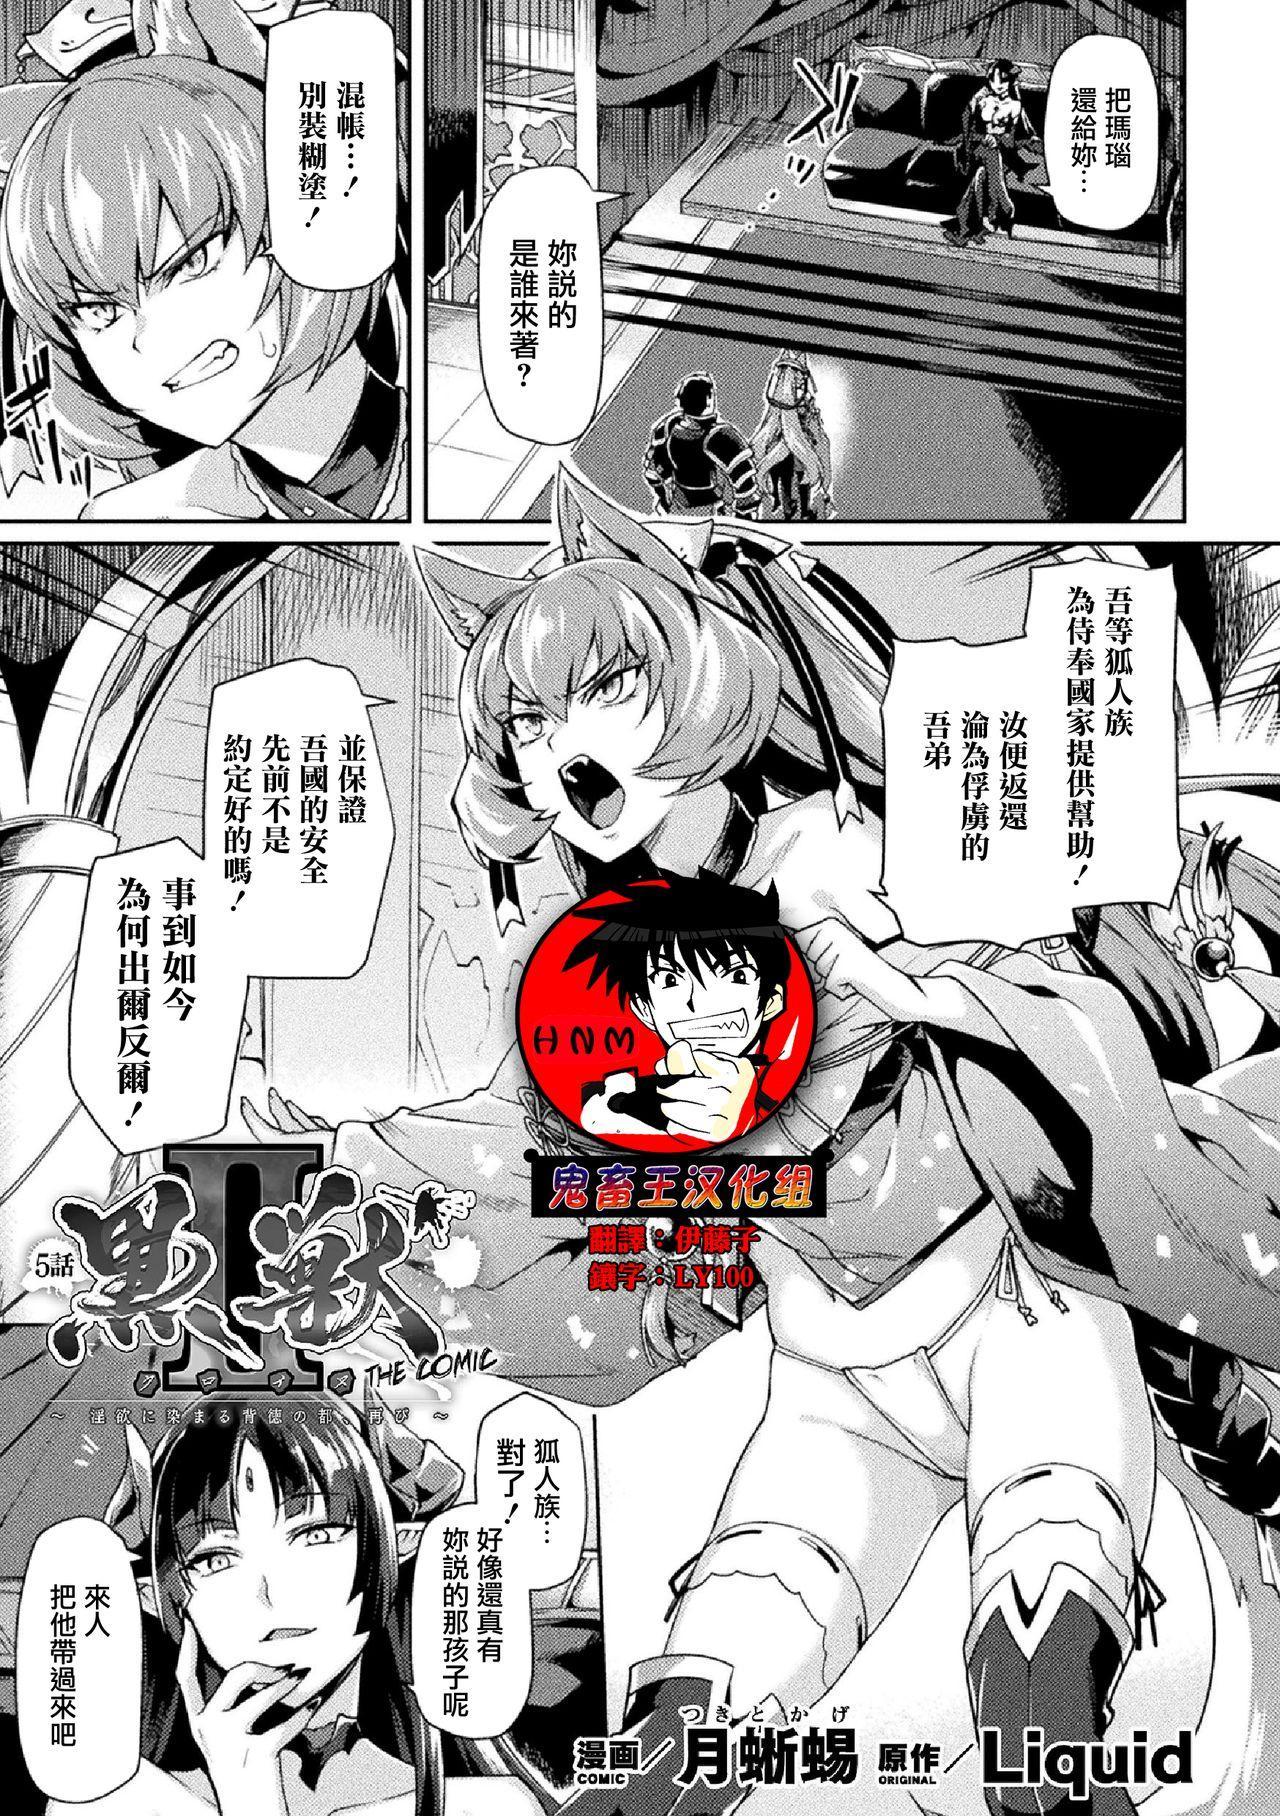 [Tsukitokage] Kuroinu II ~Inyoku ni Somaru Haitoku no Miyako, Futatabi~ THE COMIC Chapter 5 (Kukkoro Heroines Vol. 5) [Digital] [Chinese] [鬼畜王漢化組] [Digital] 0